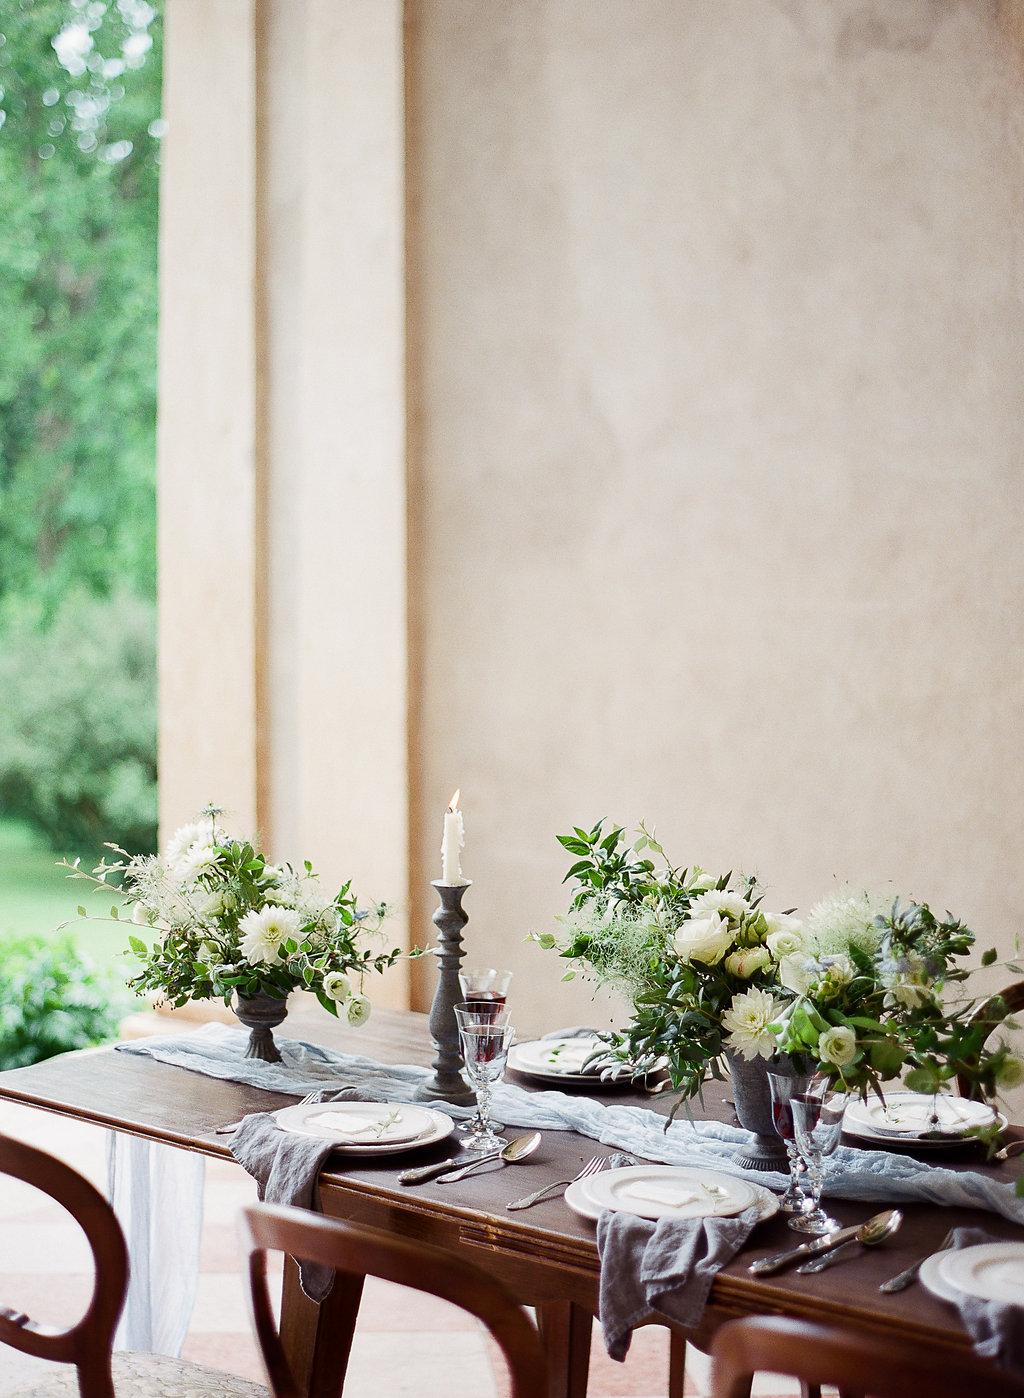 Verona-Destination-Wedding-Inspiration-by-Kibogo-Photography44.jpg